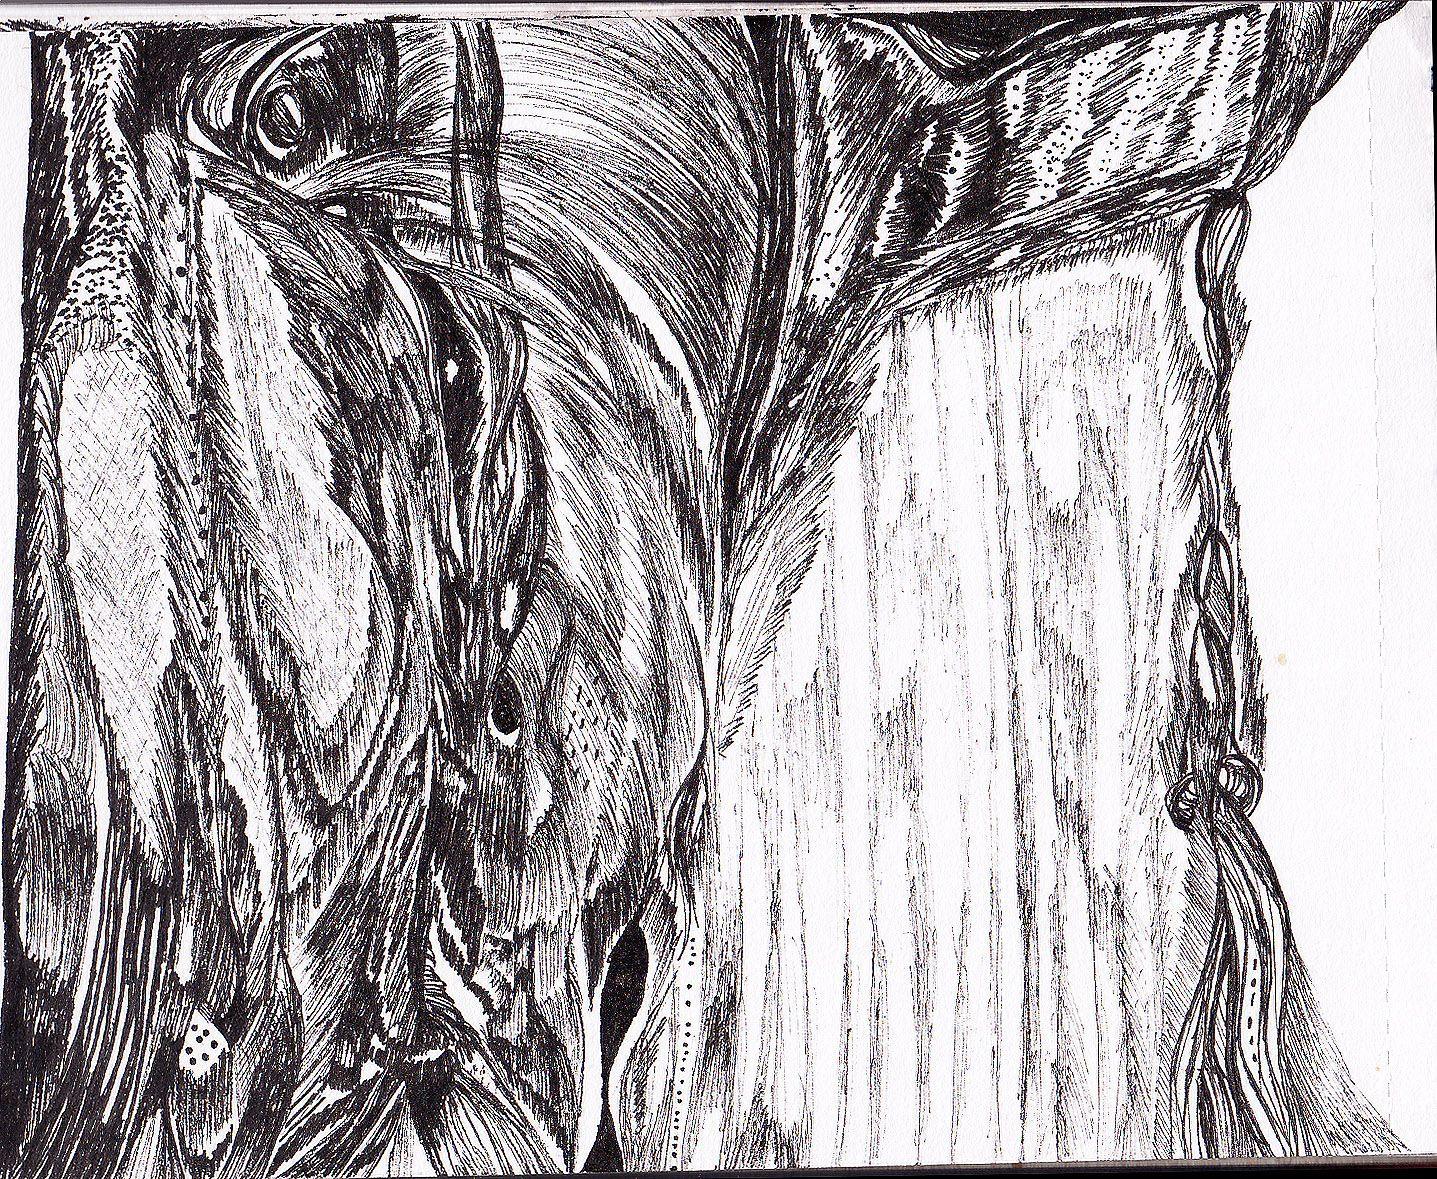 Abstract Black Pen Drawing Art Drawing Black Pen